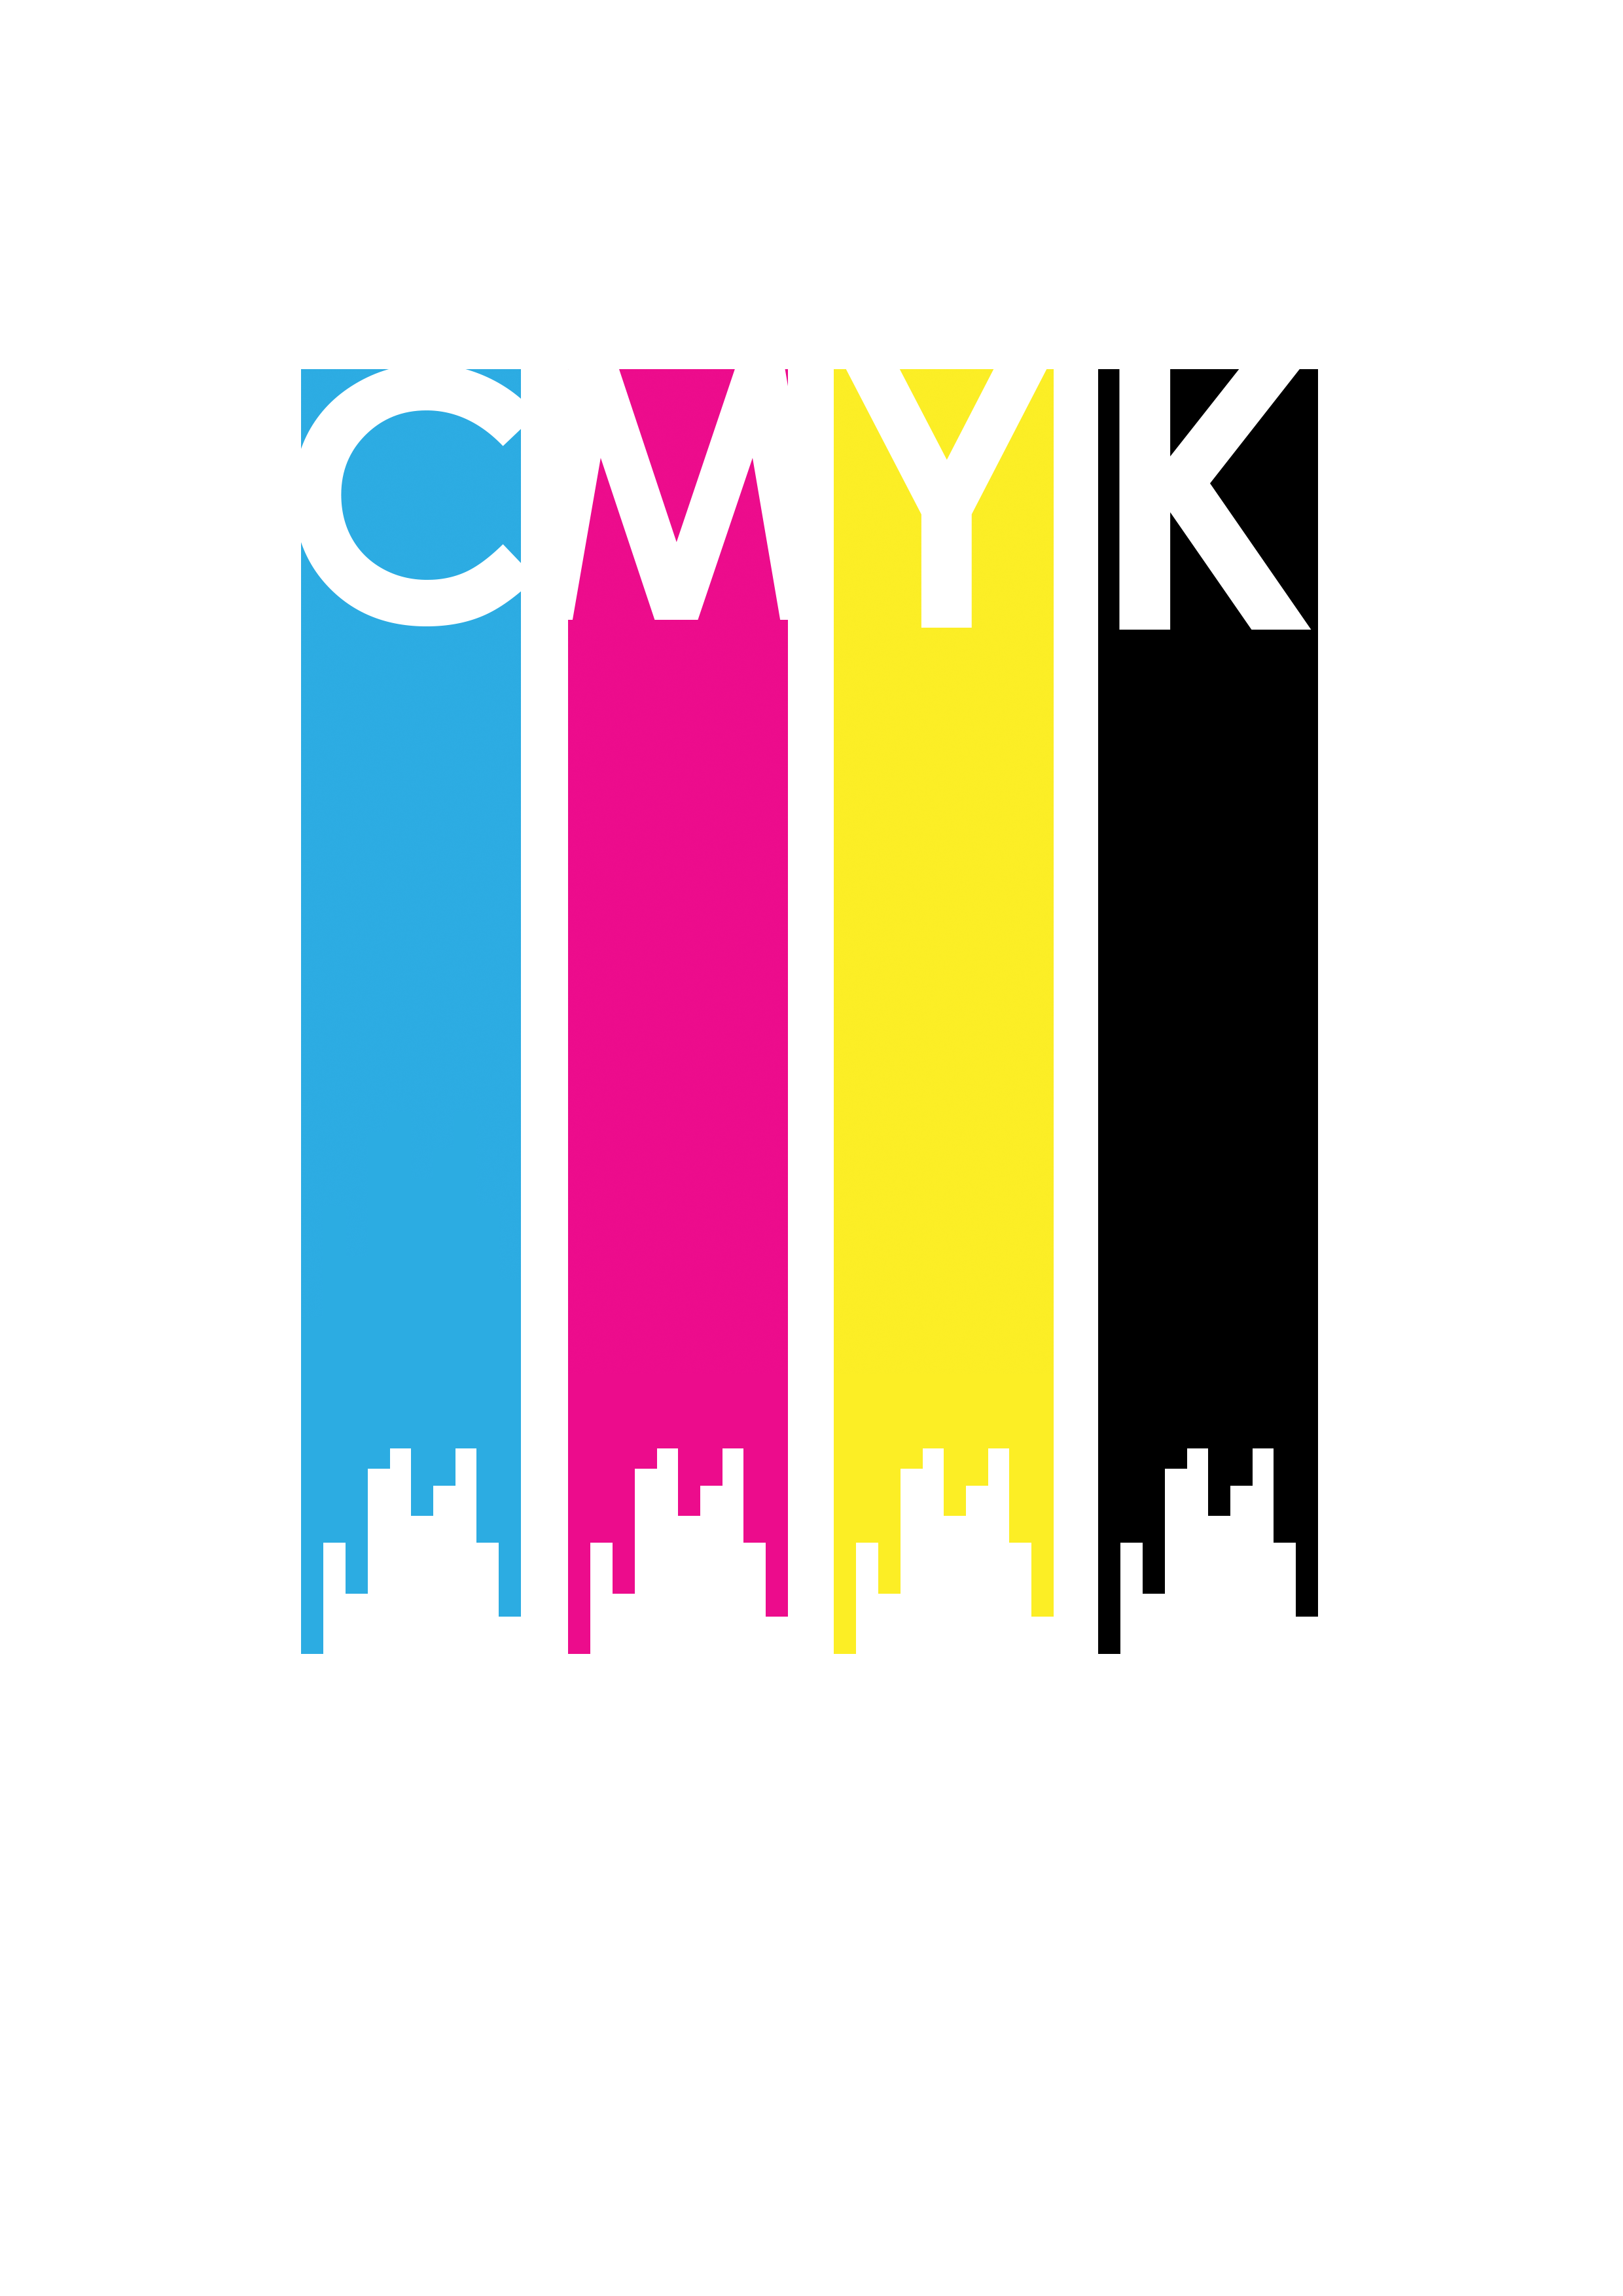 CMYK creative design